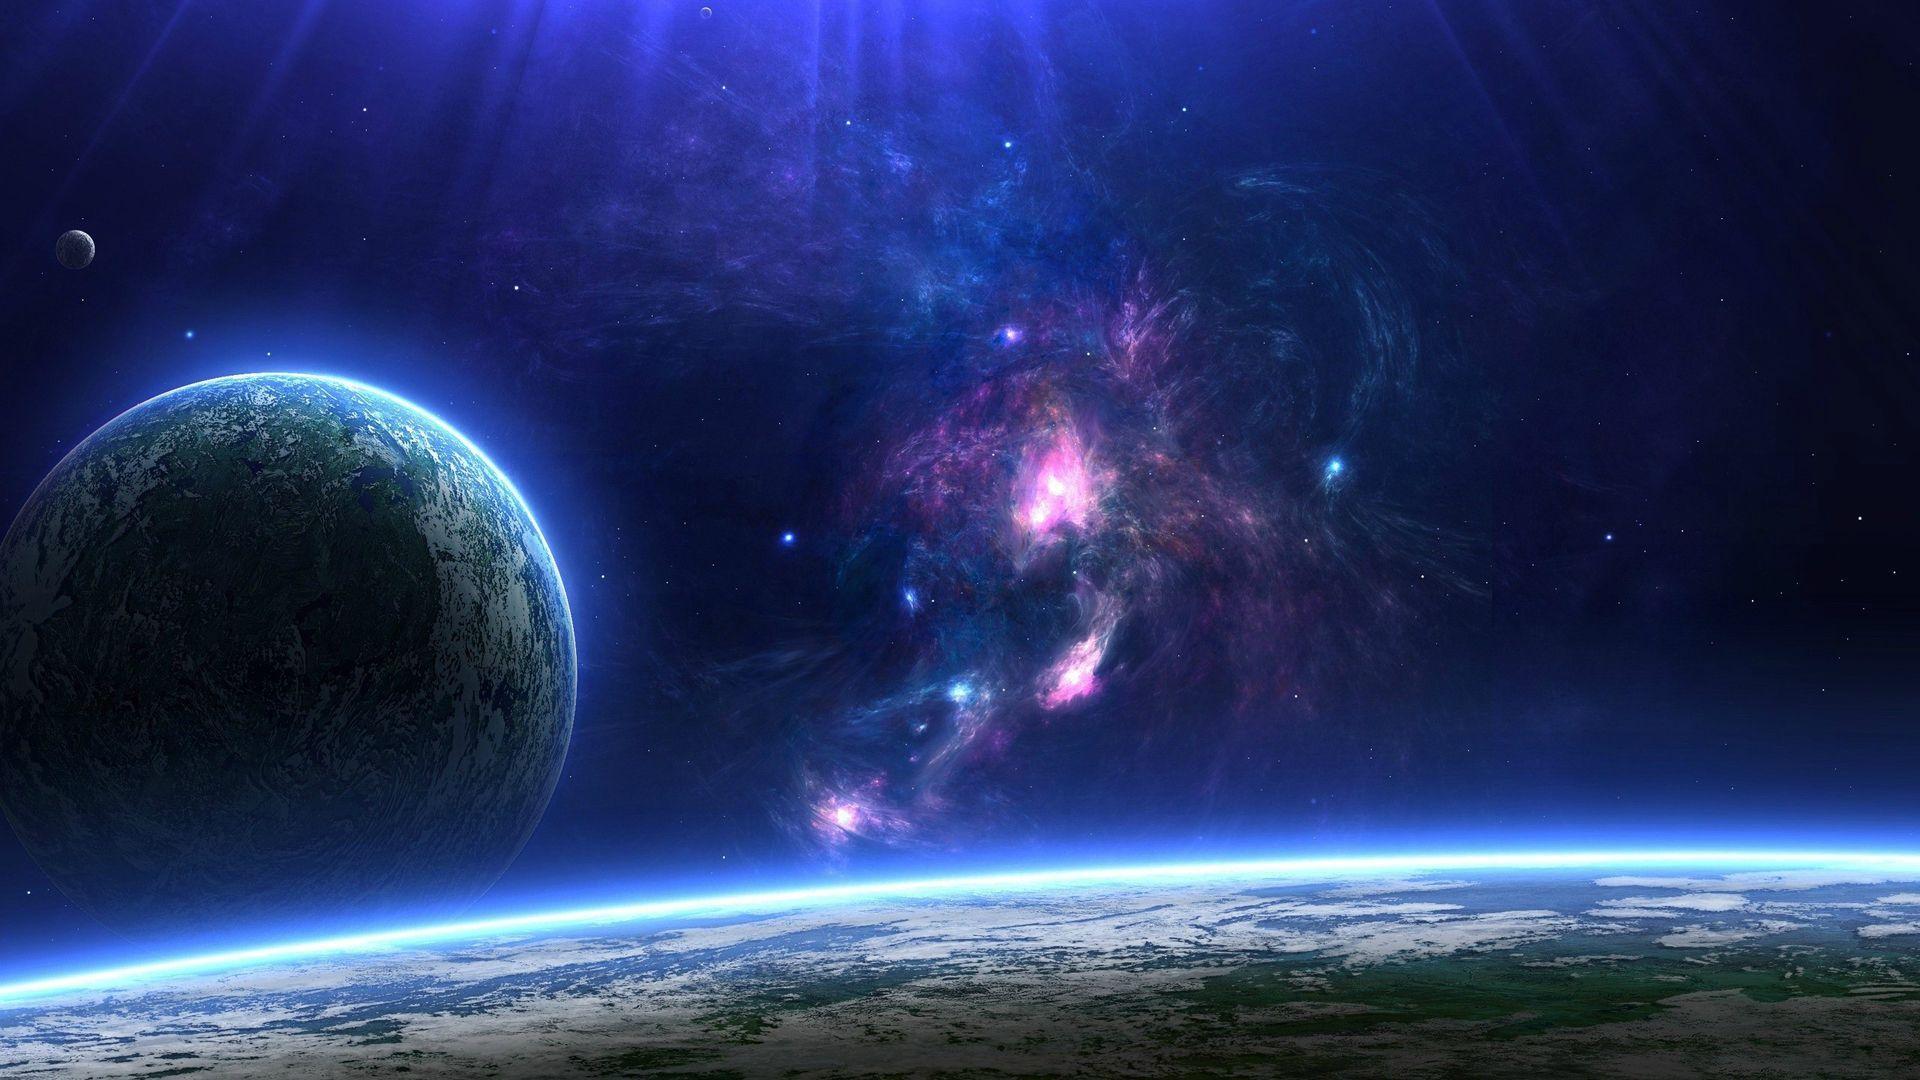 aurora borealis wallpaper hd | aurora borealis from space hd